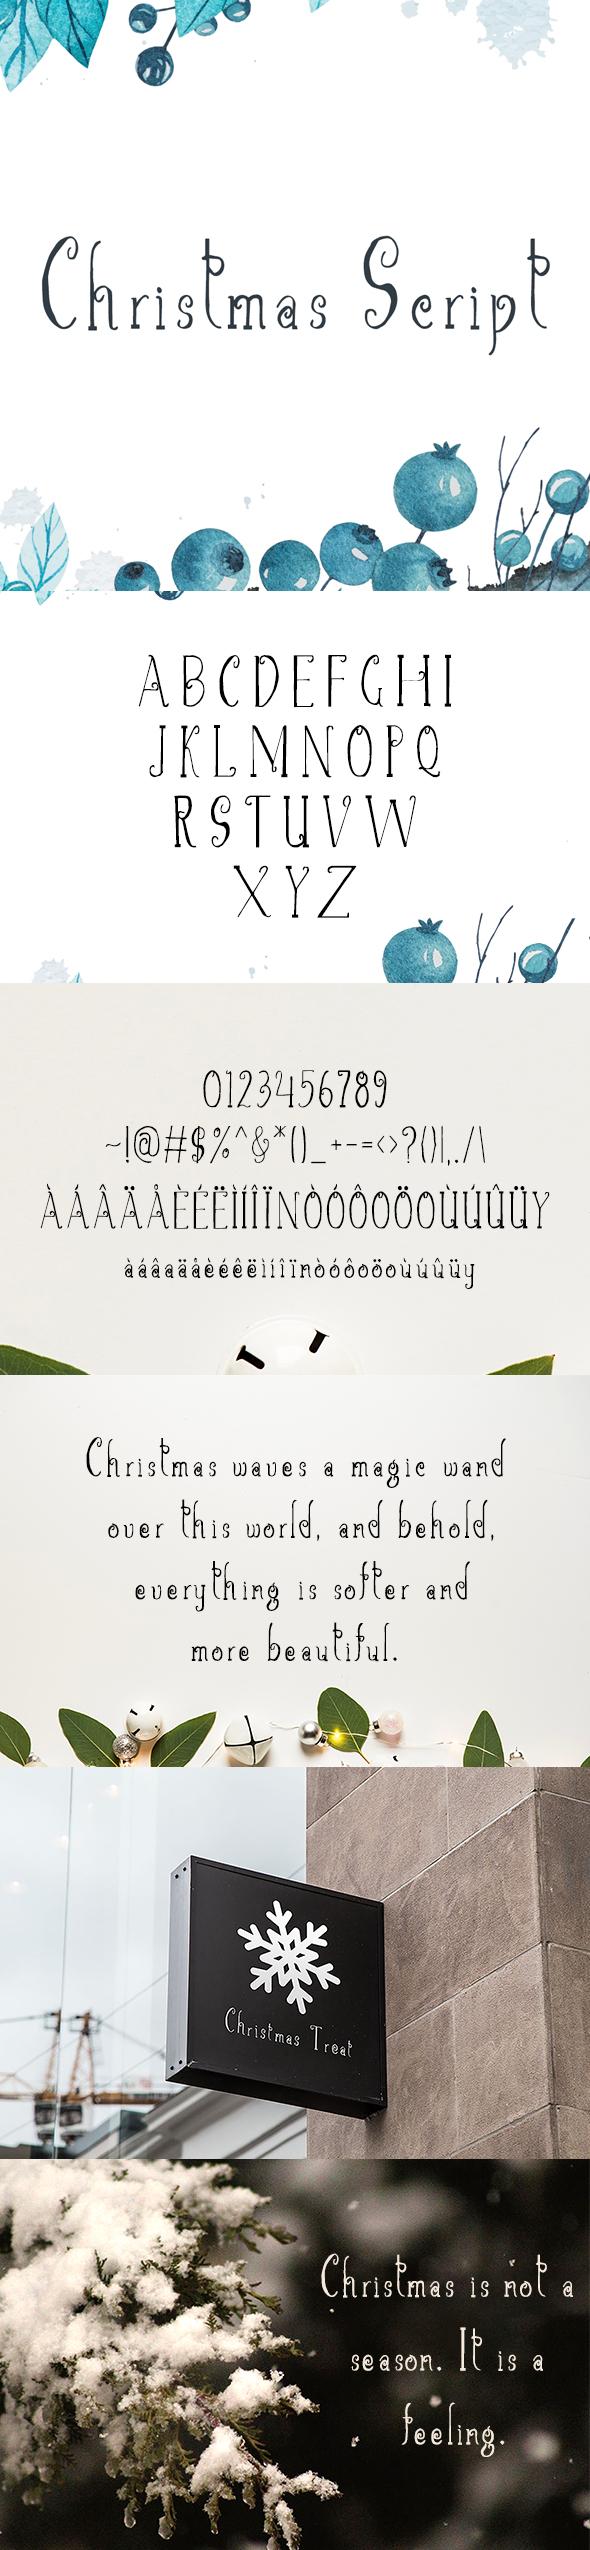 Christmas Script Font - Hand-writing Script